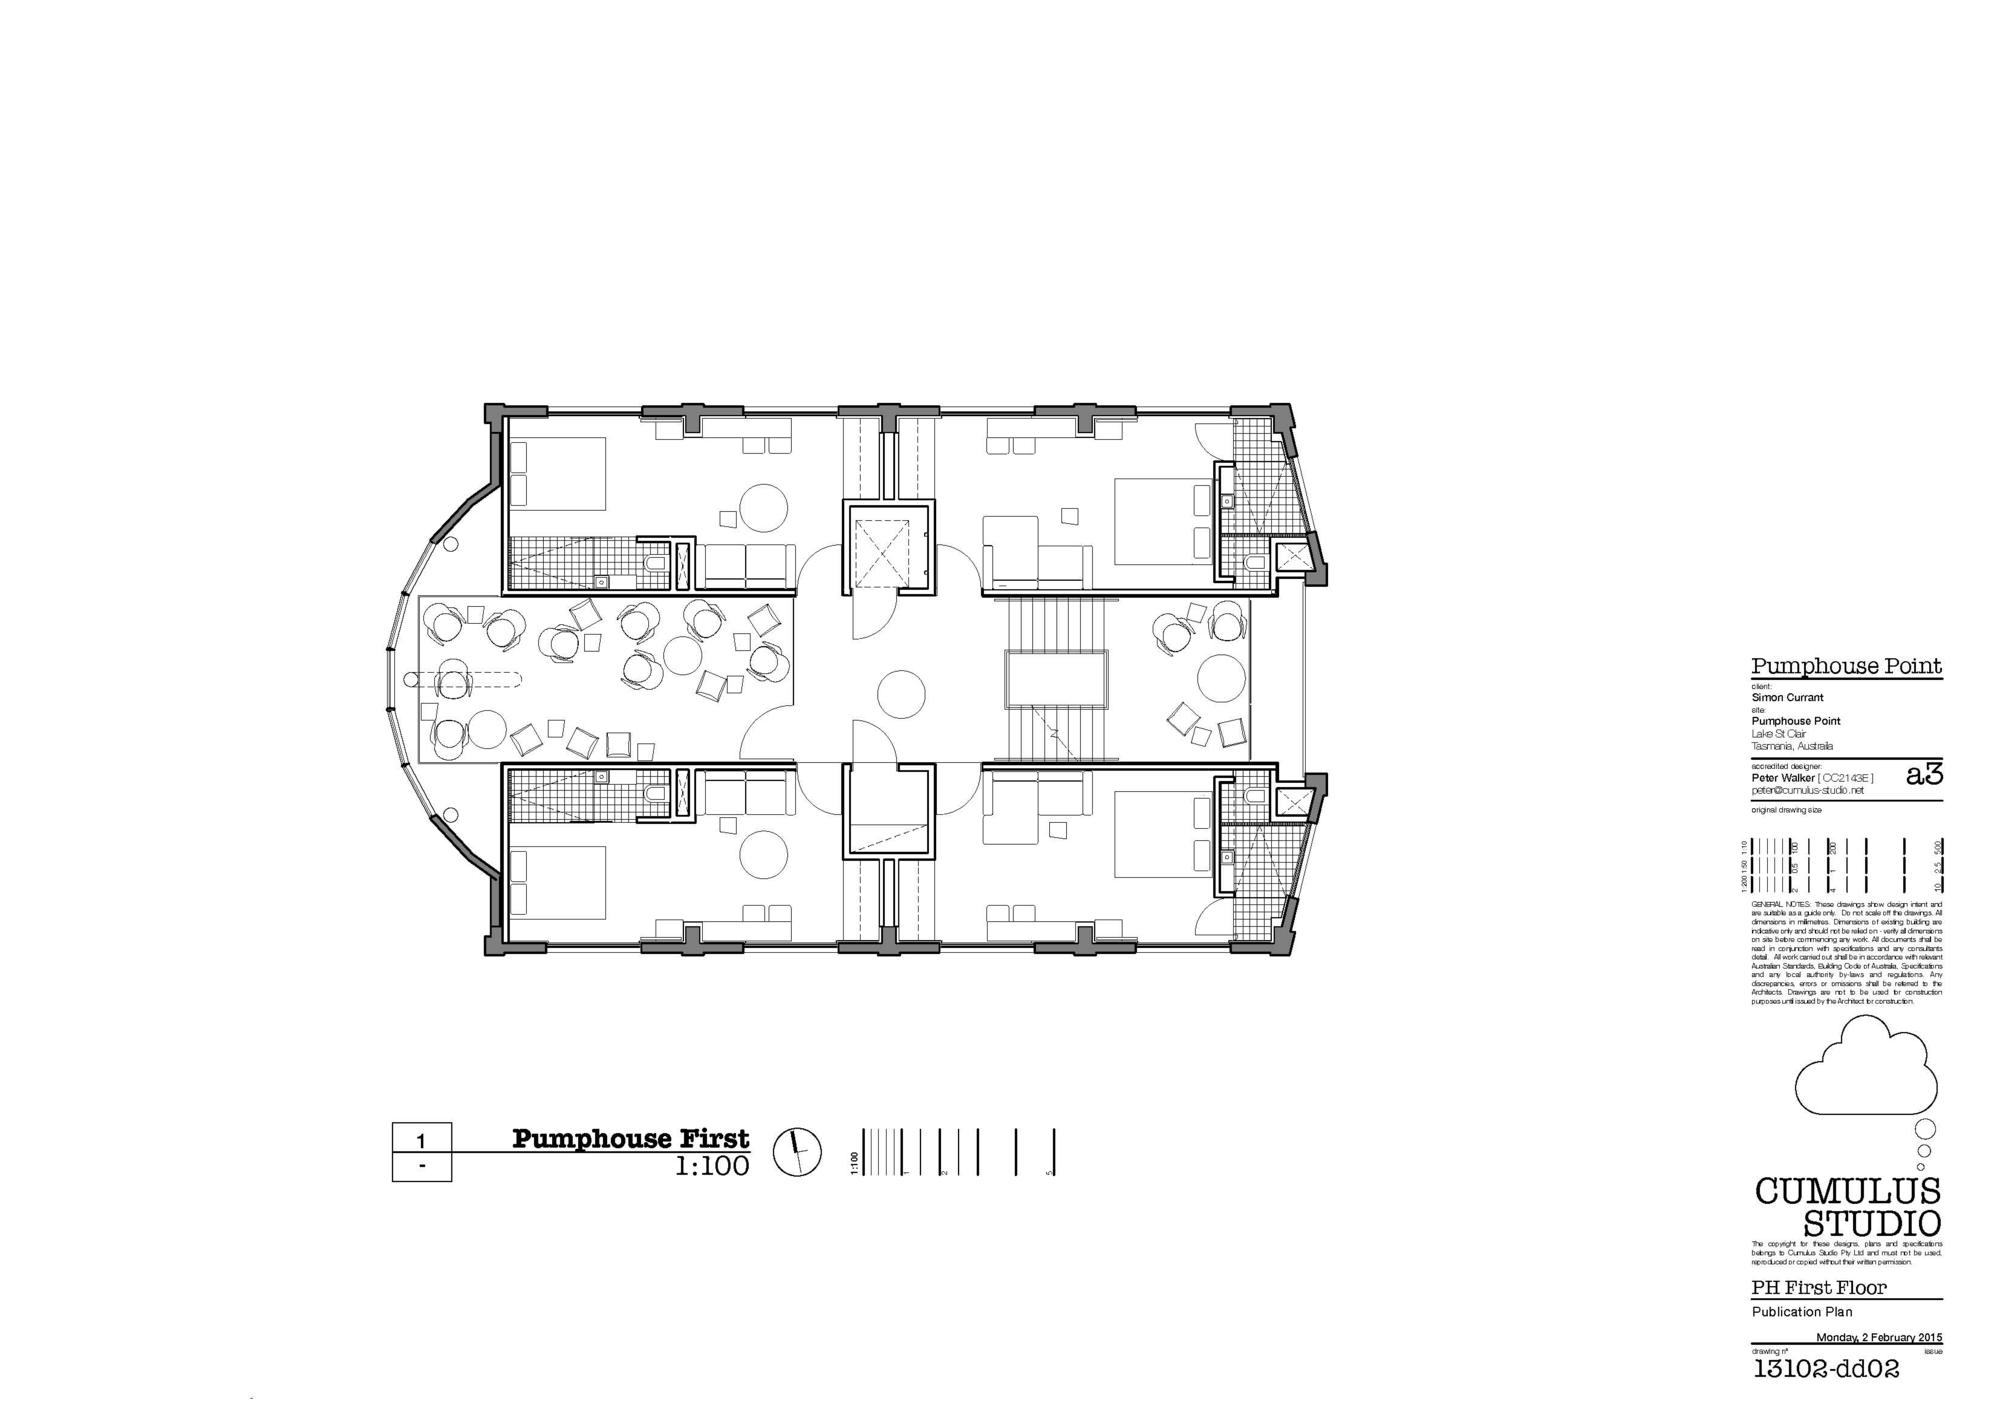 Pumphouse_Point-Cumulus_Studio-30